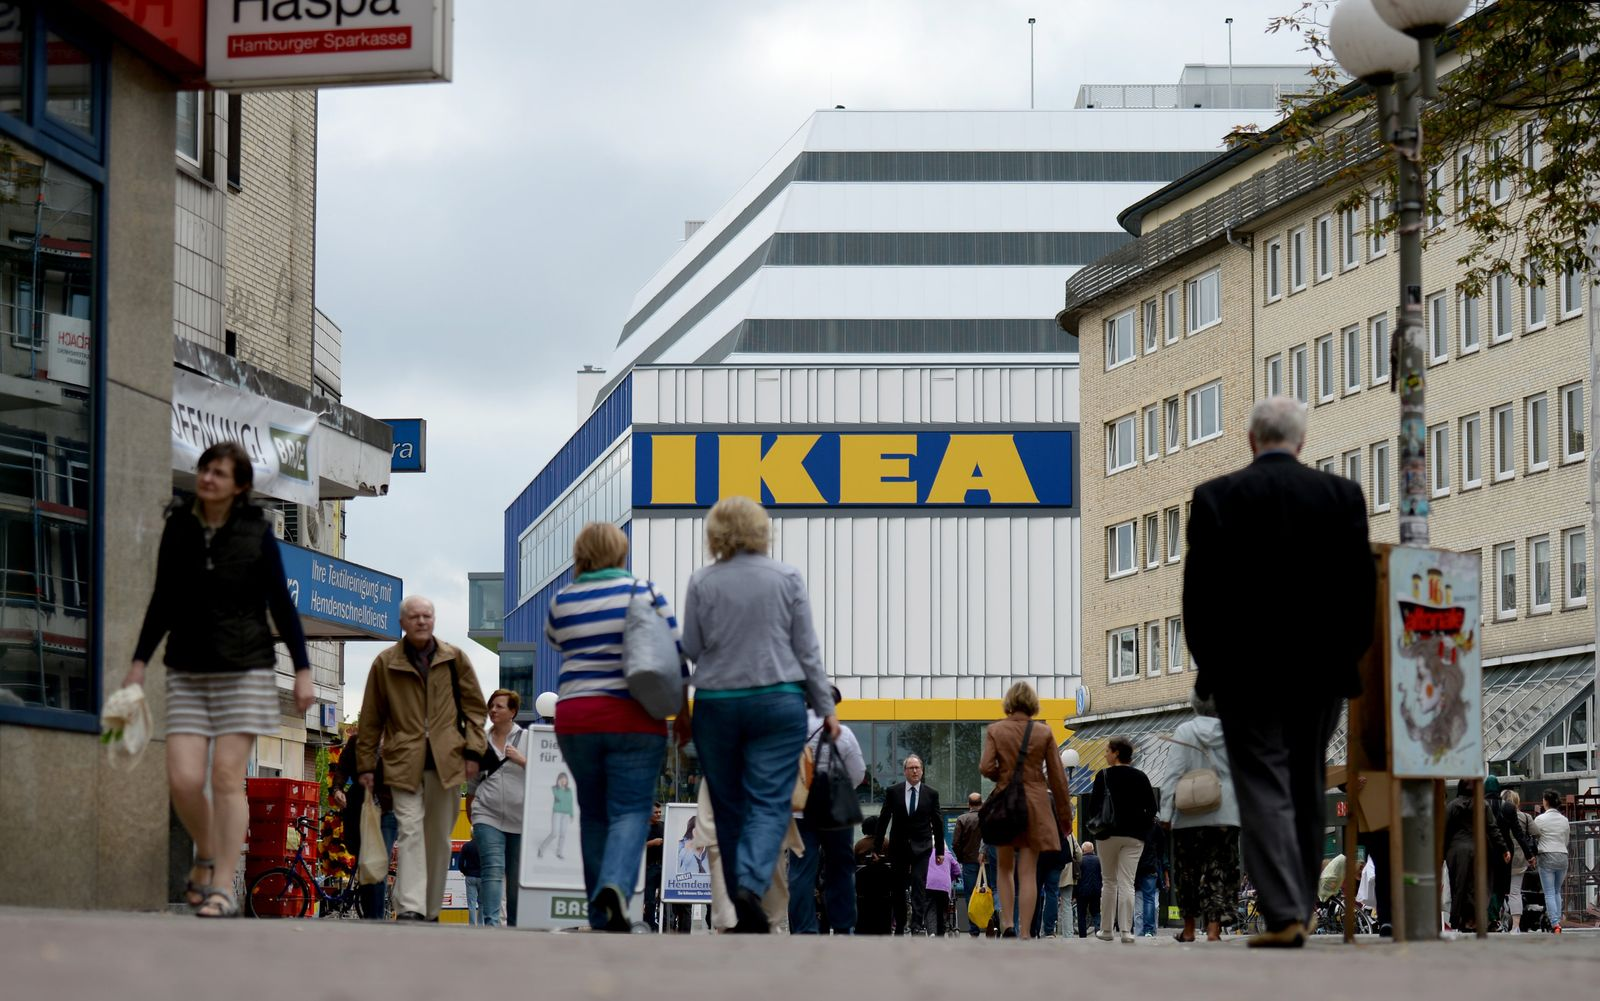 Ikea / Filiale / Hamburg-Altona